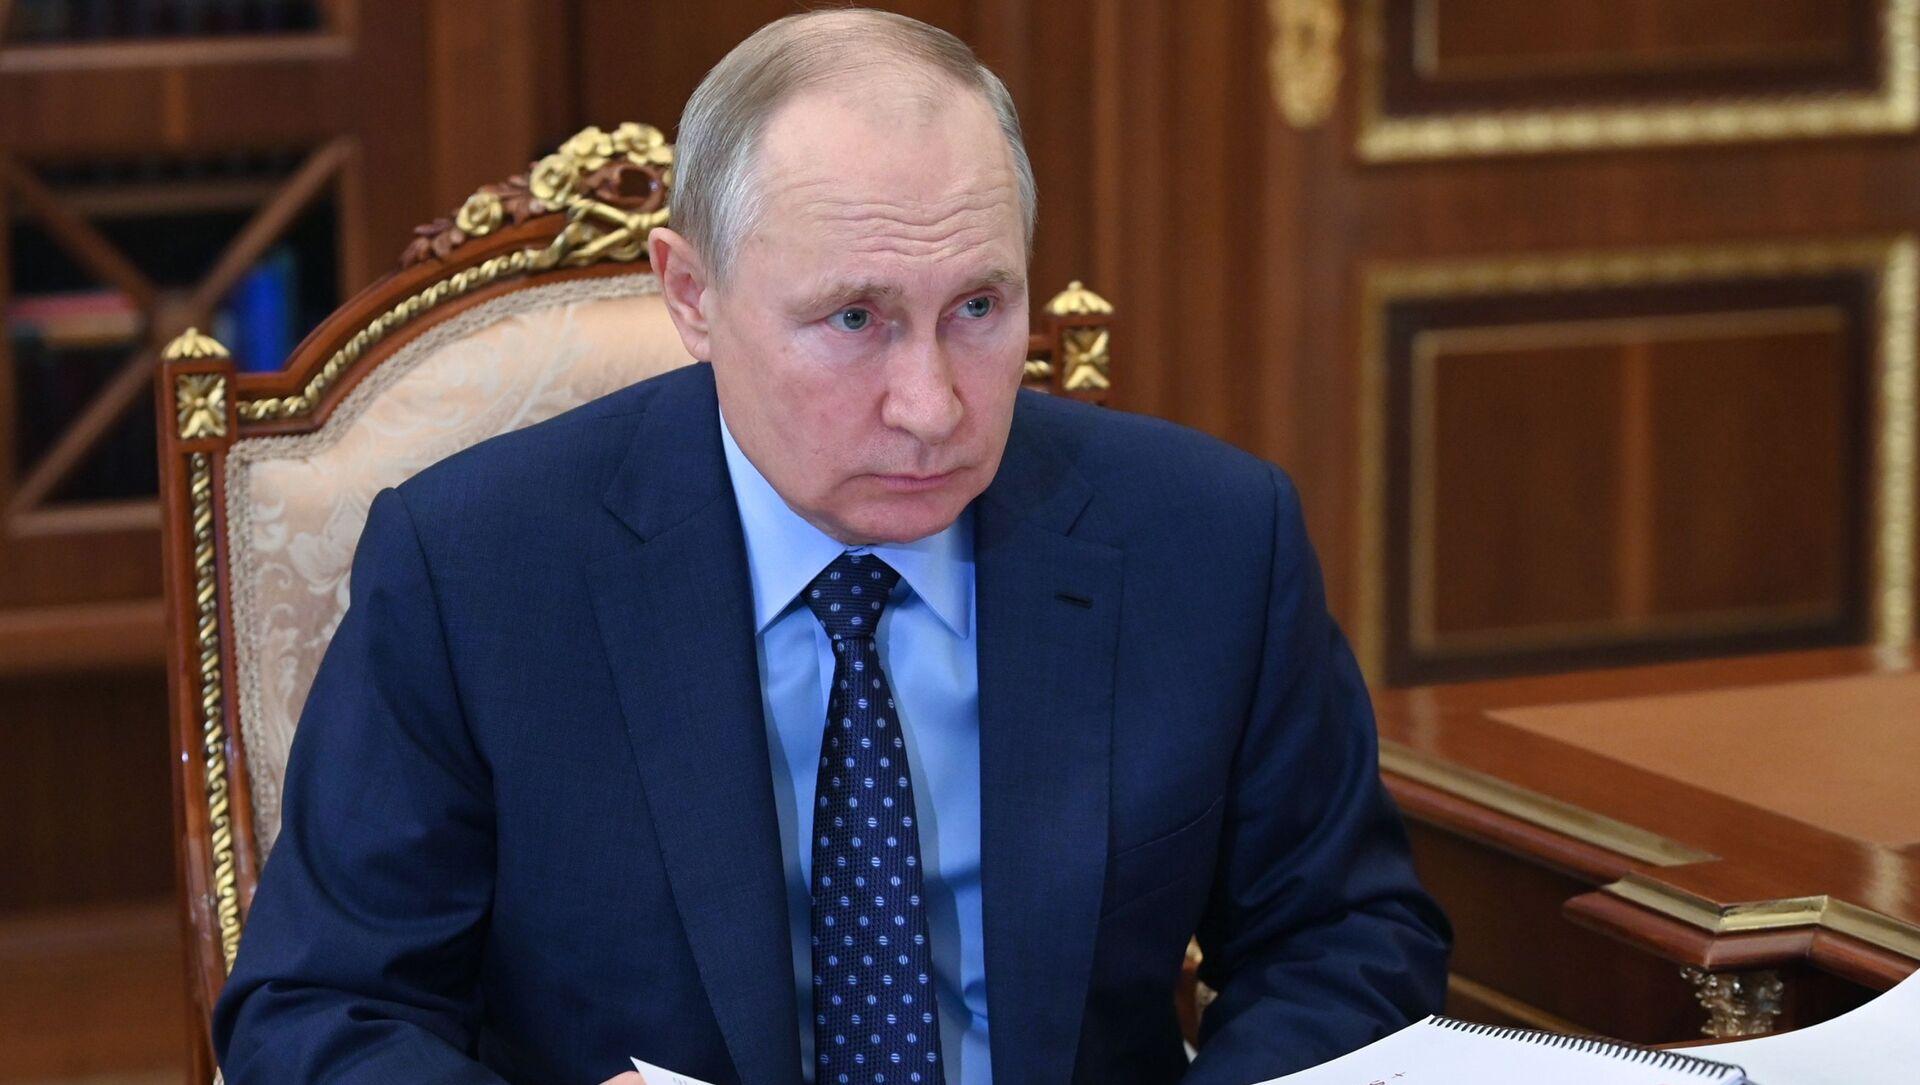 Tổng thống Nga Vladimir Putin - Sputnik Việt Nam, 1920, 30.08.2021